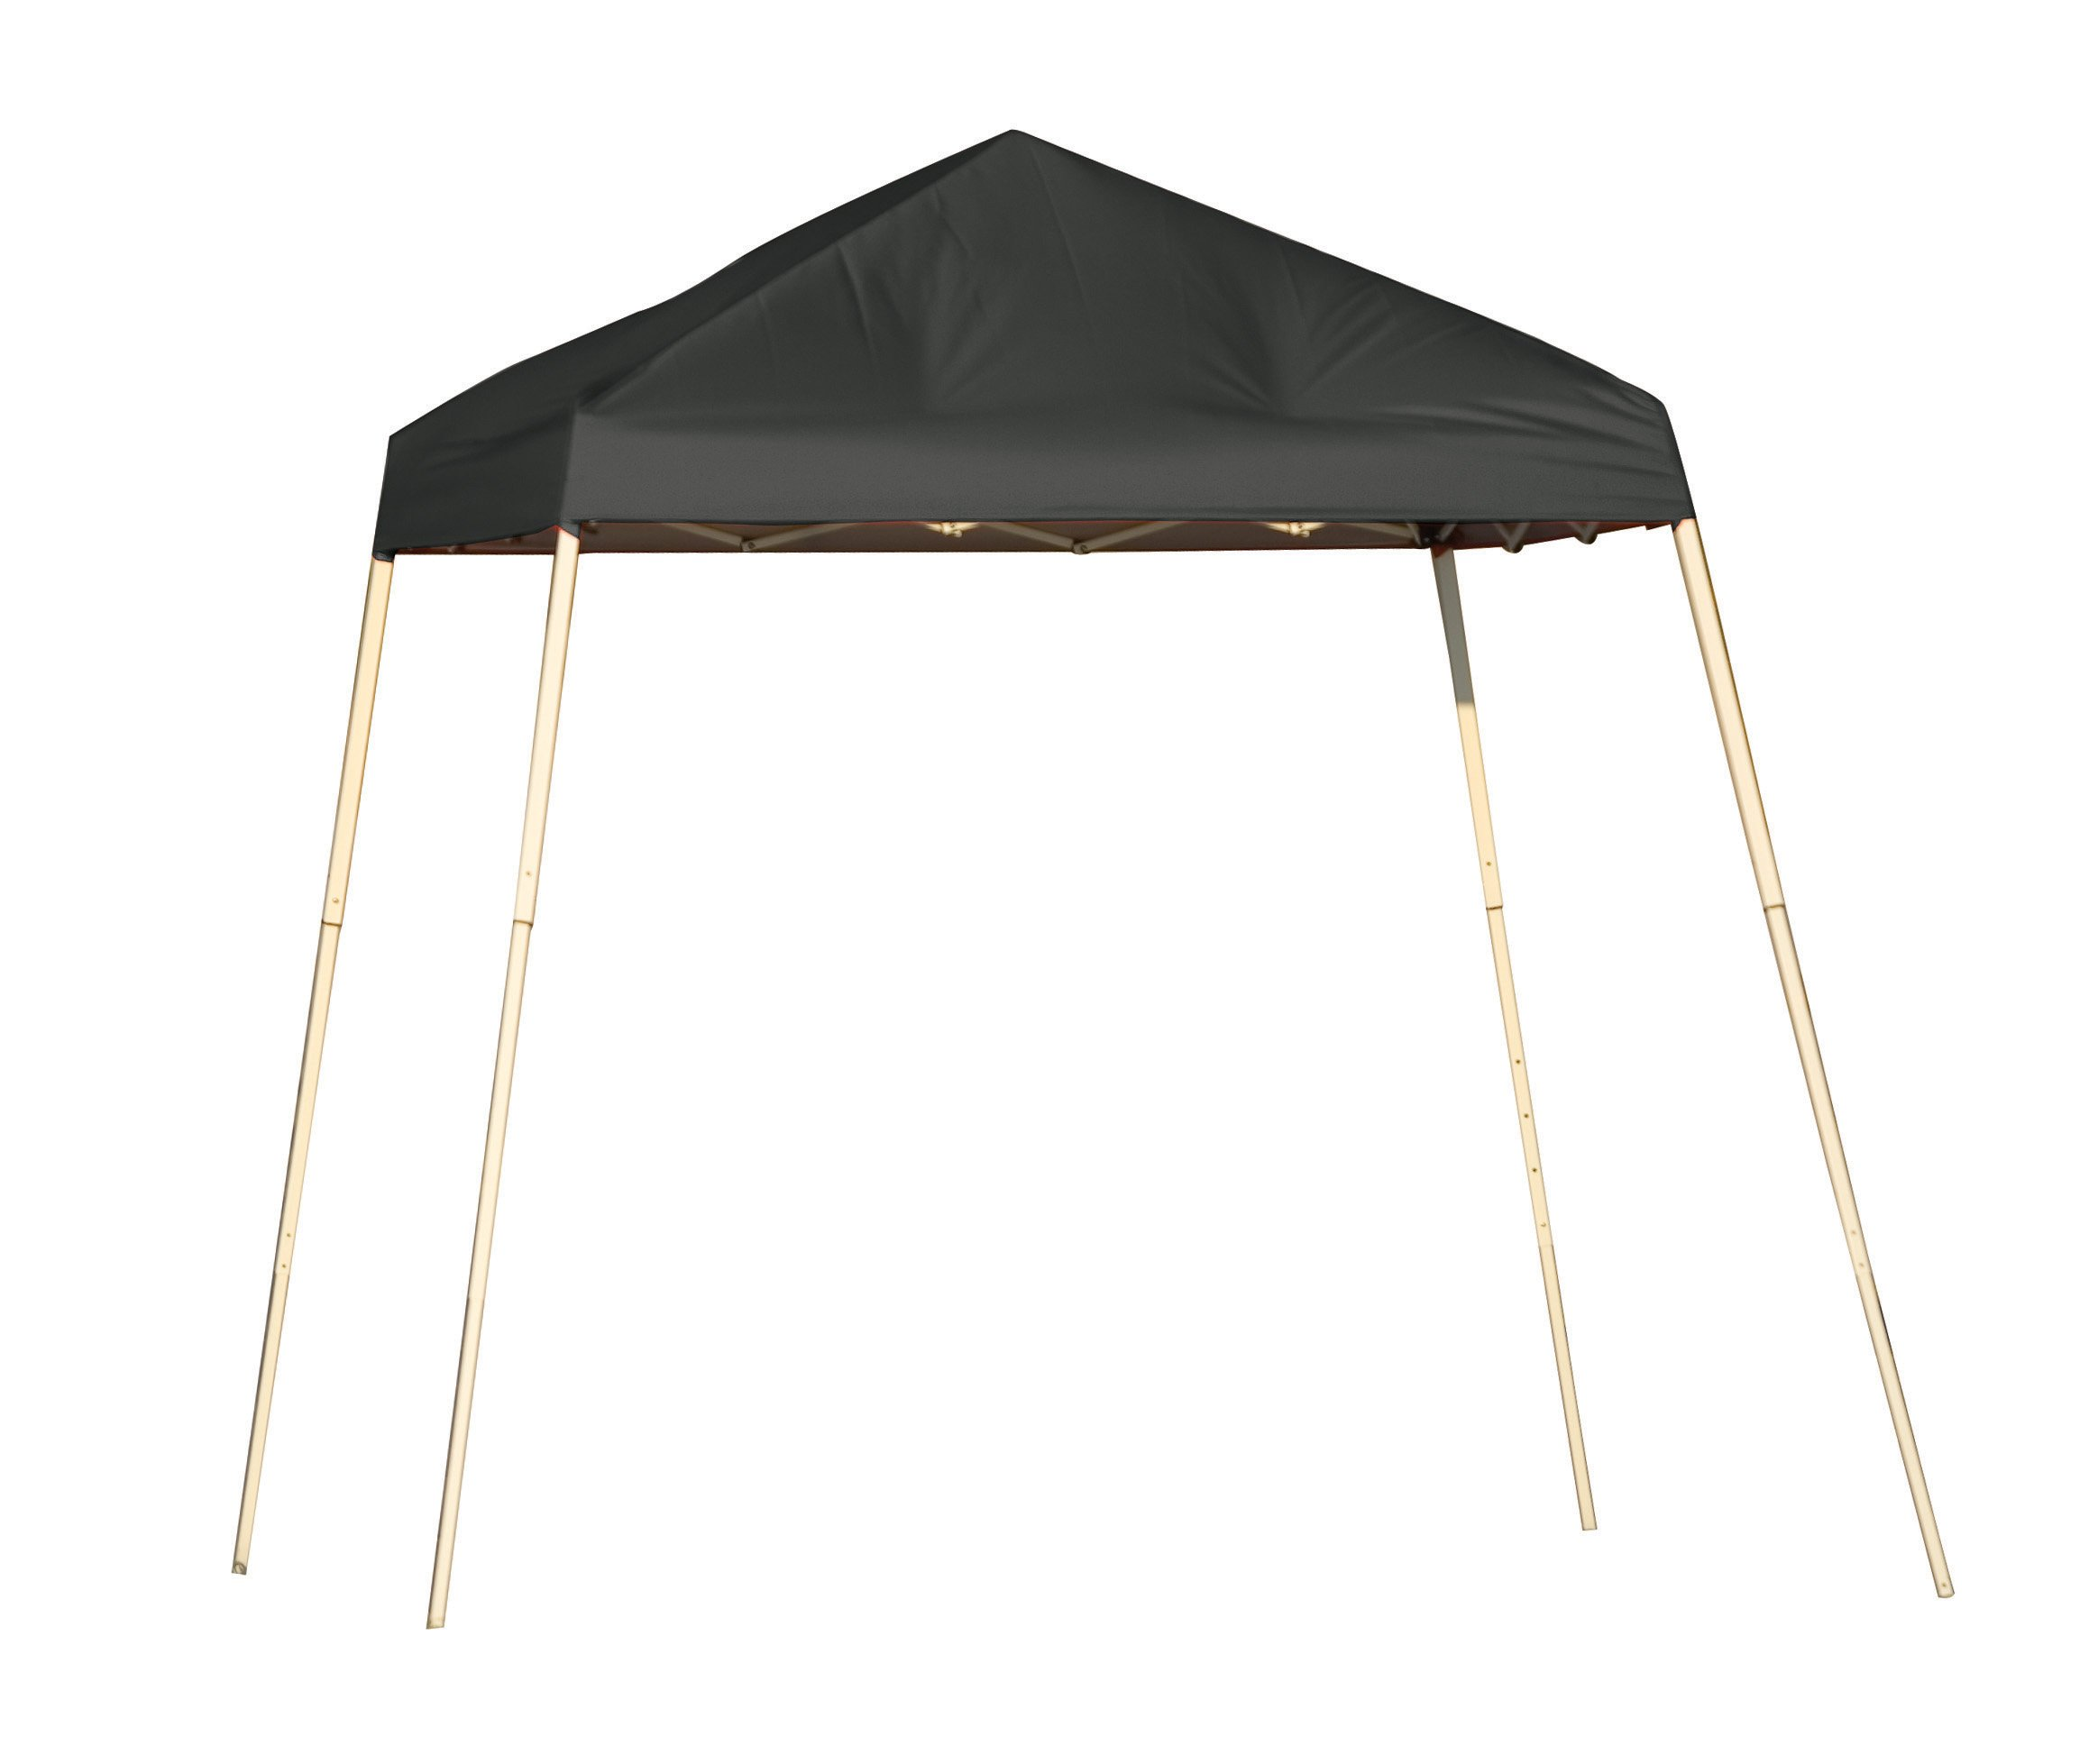 ShelterLogic Slant Leg Pop-Up Canopy with Carry Bag, Black, 8 x 8 ft.